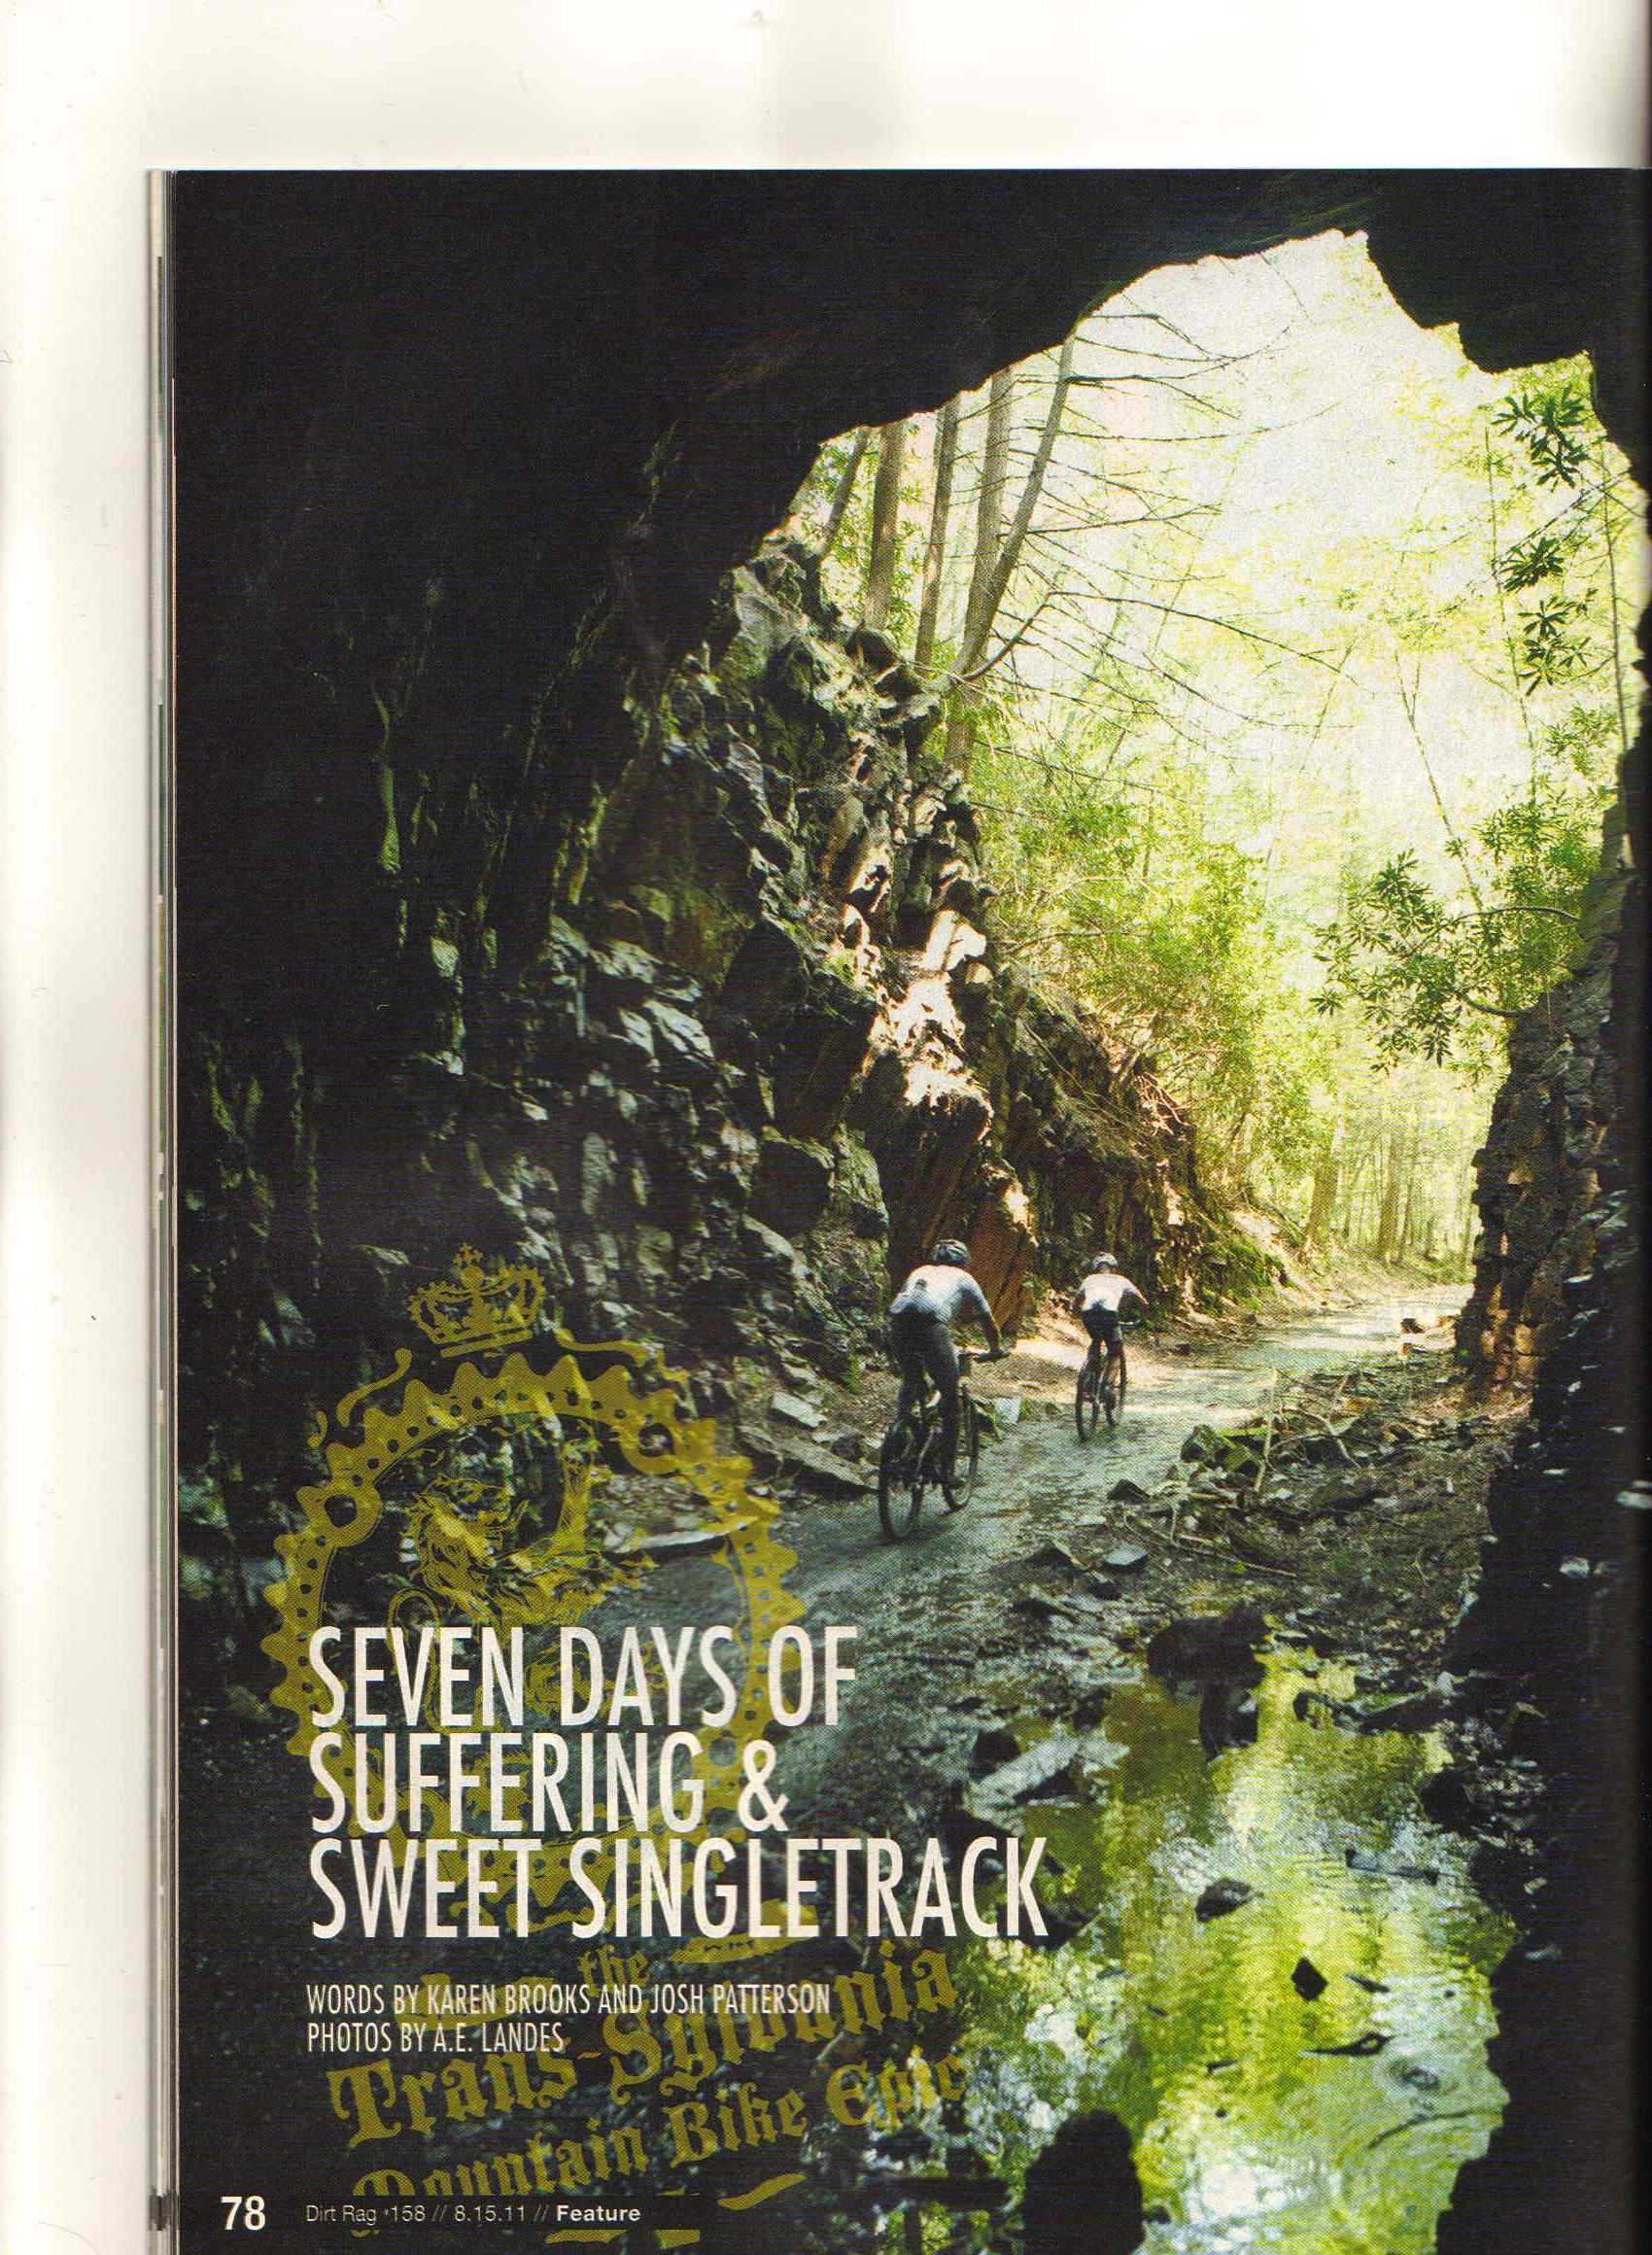 Dirt Rag pg 1 August 2011